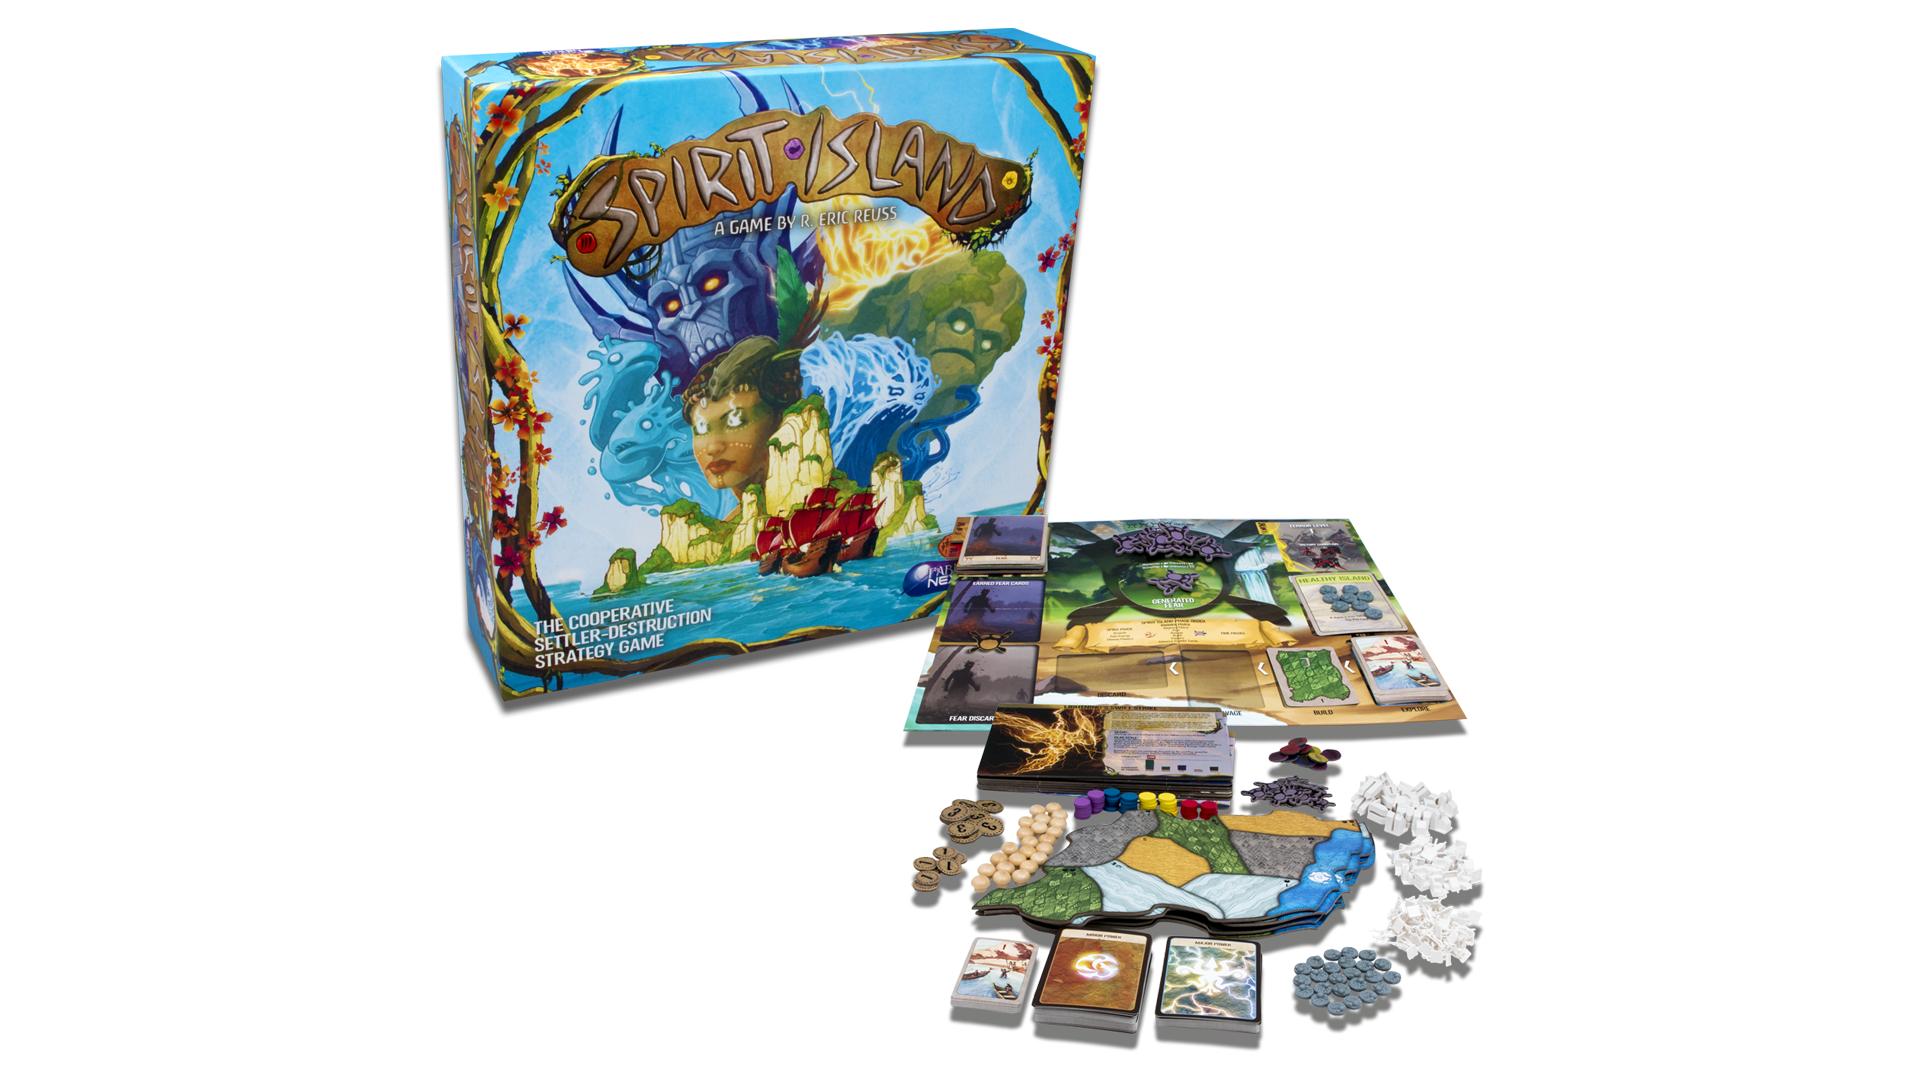 Spirit Island board game components